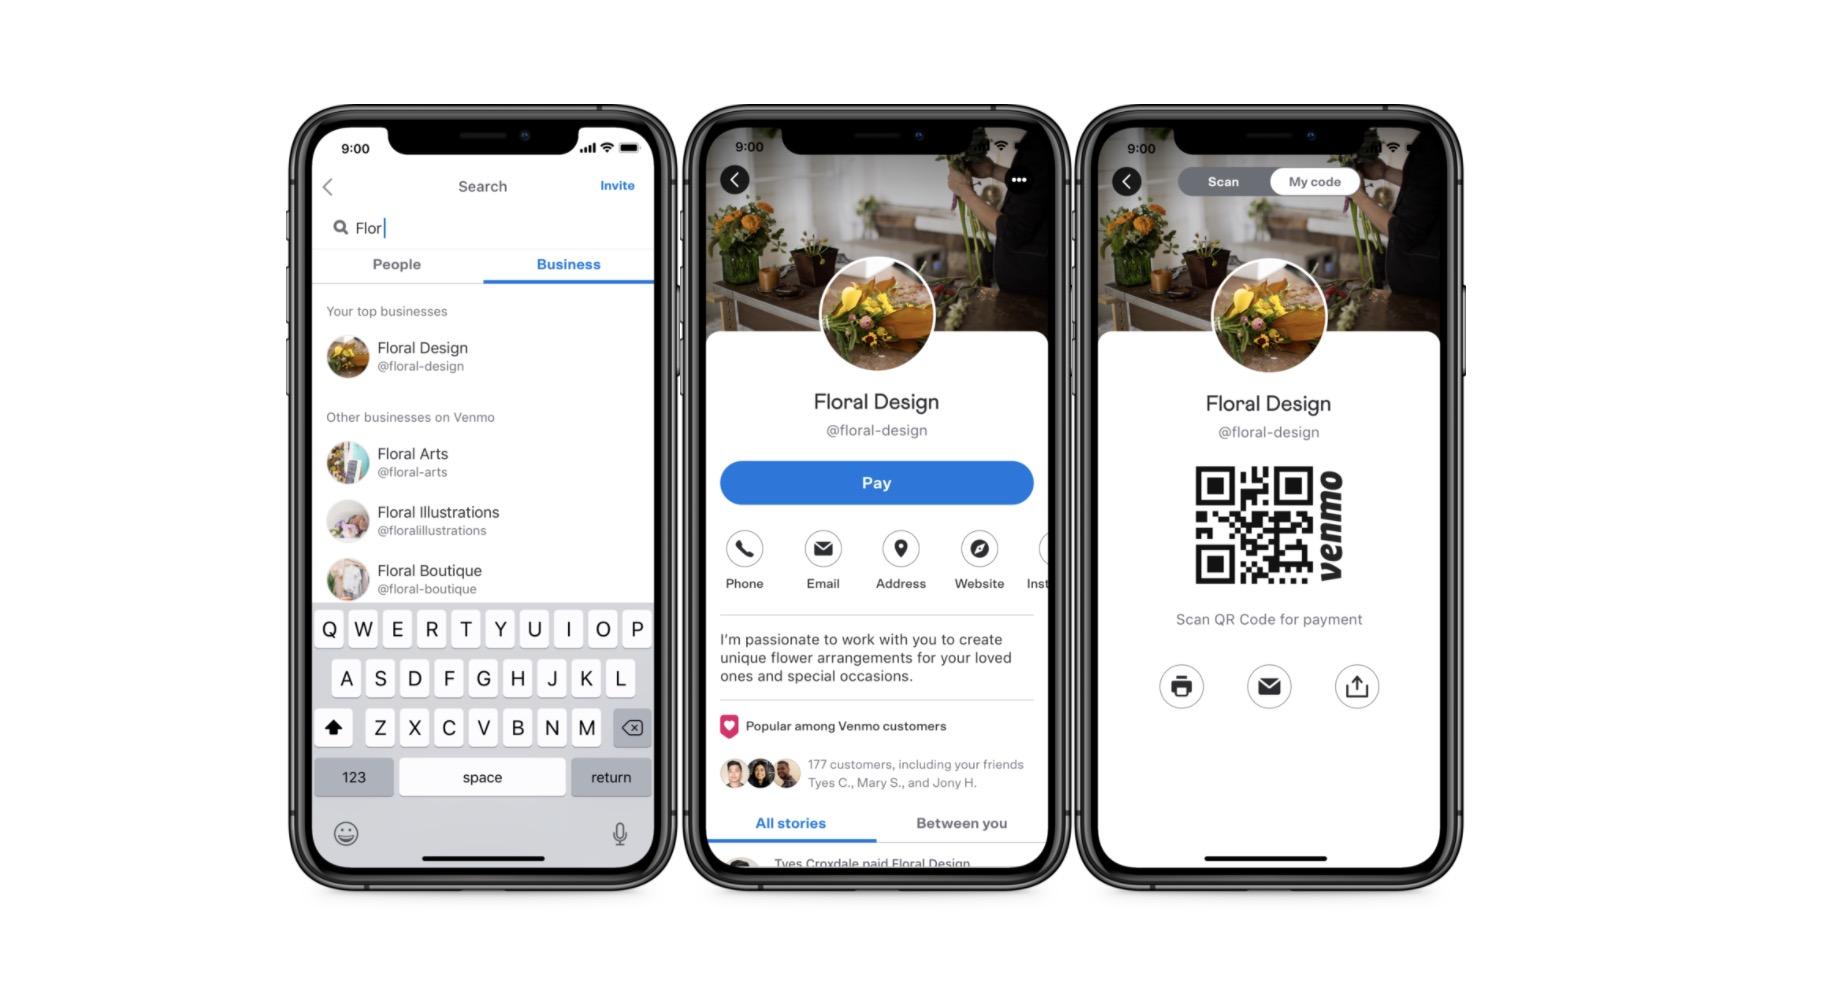 Generating a payment QR code for a vendor in Venmo